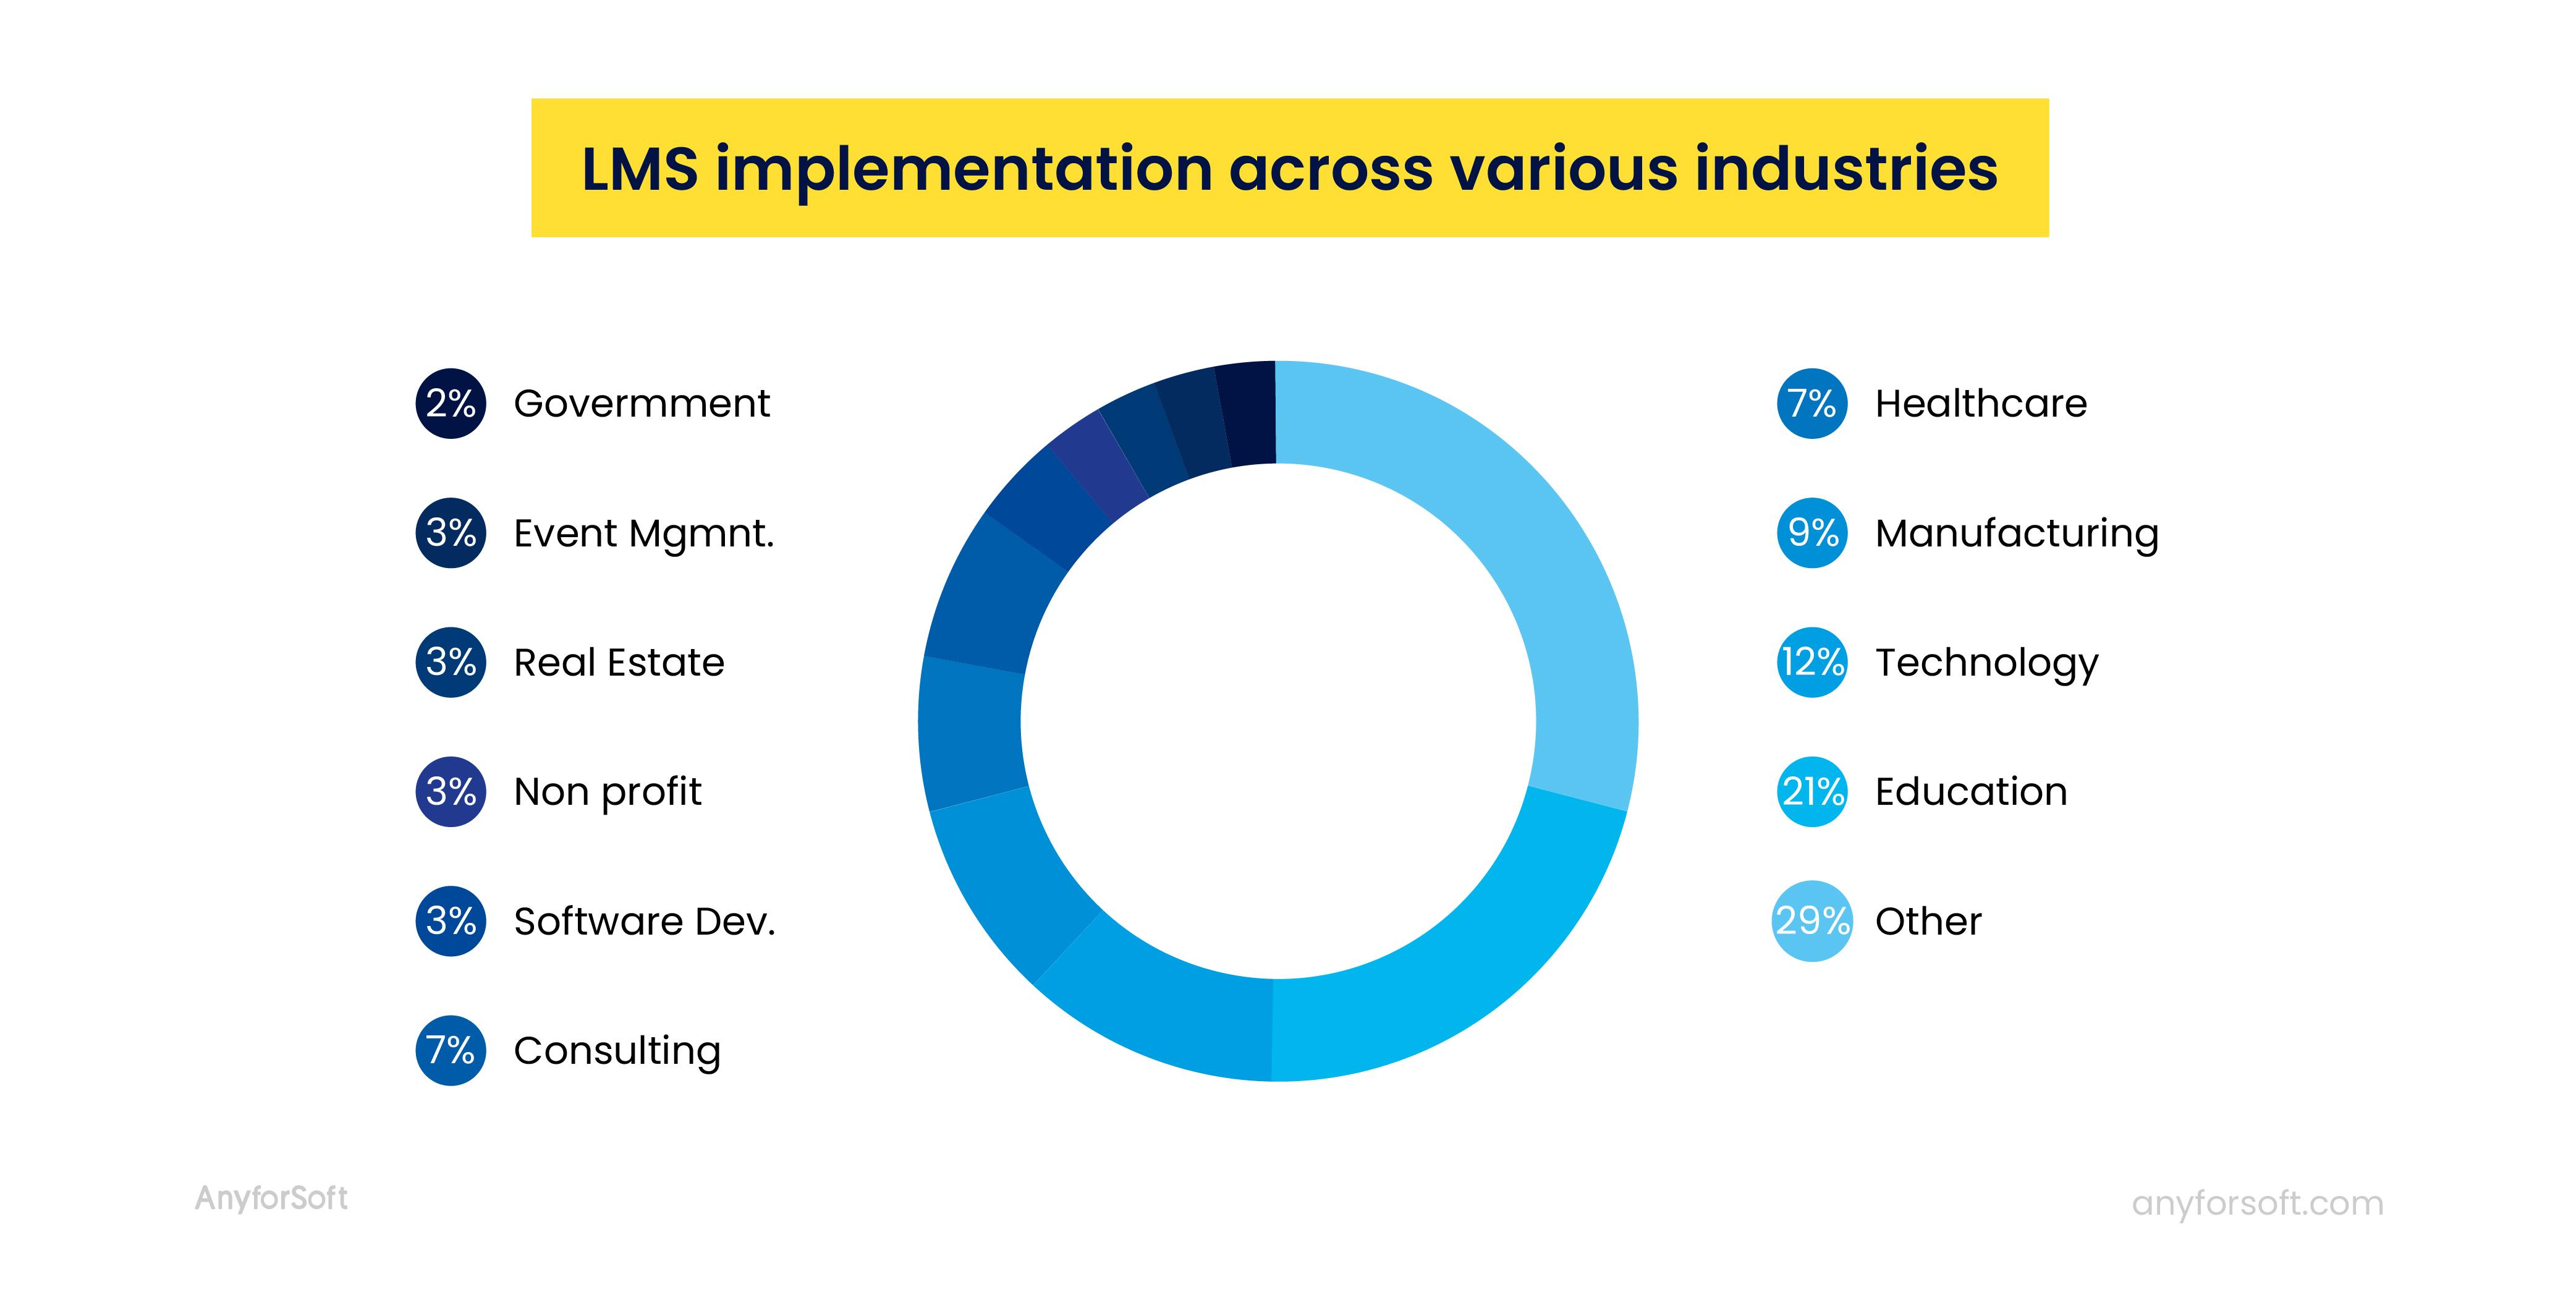 lms implementation across industries